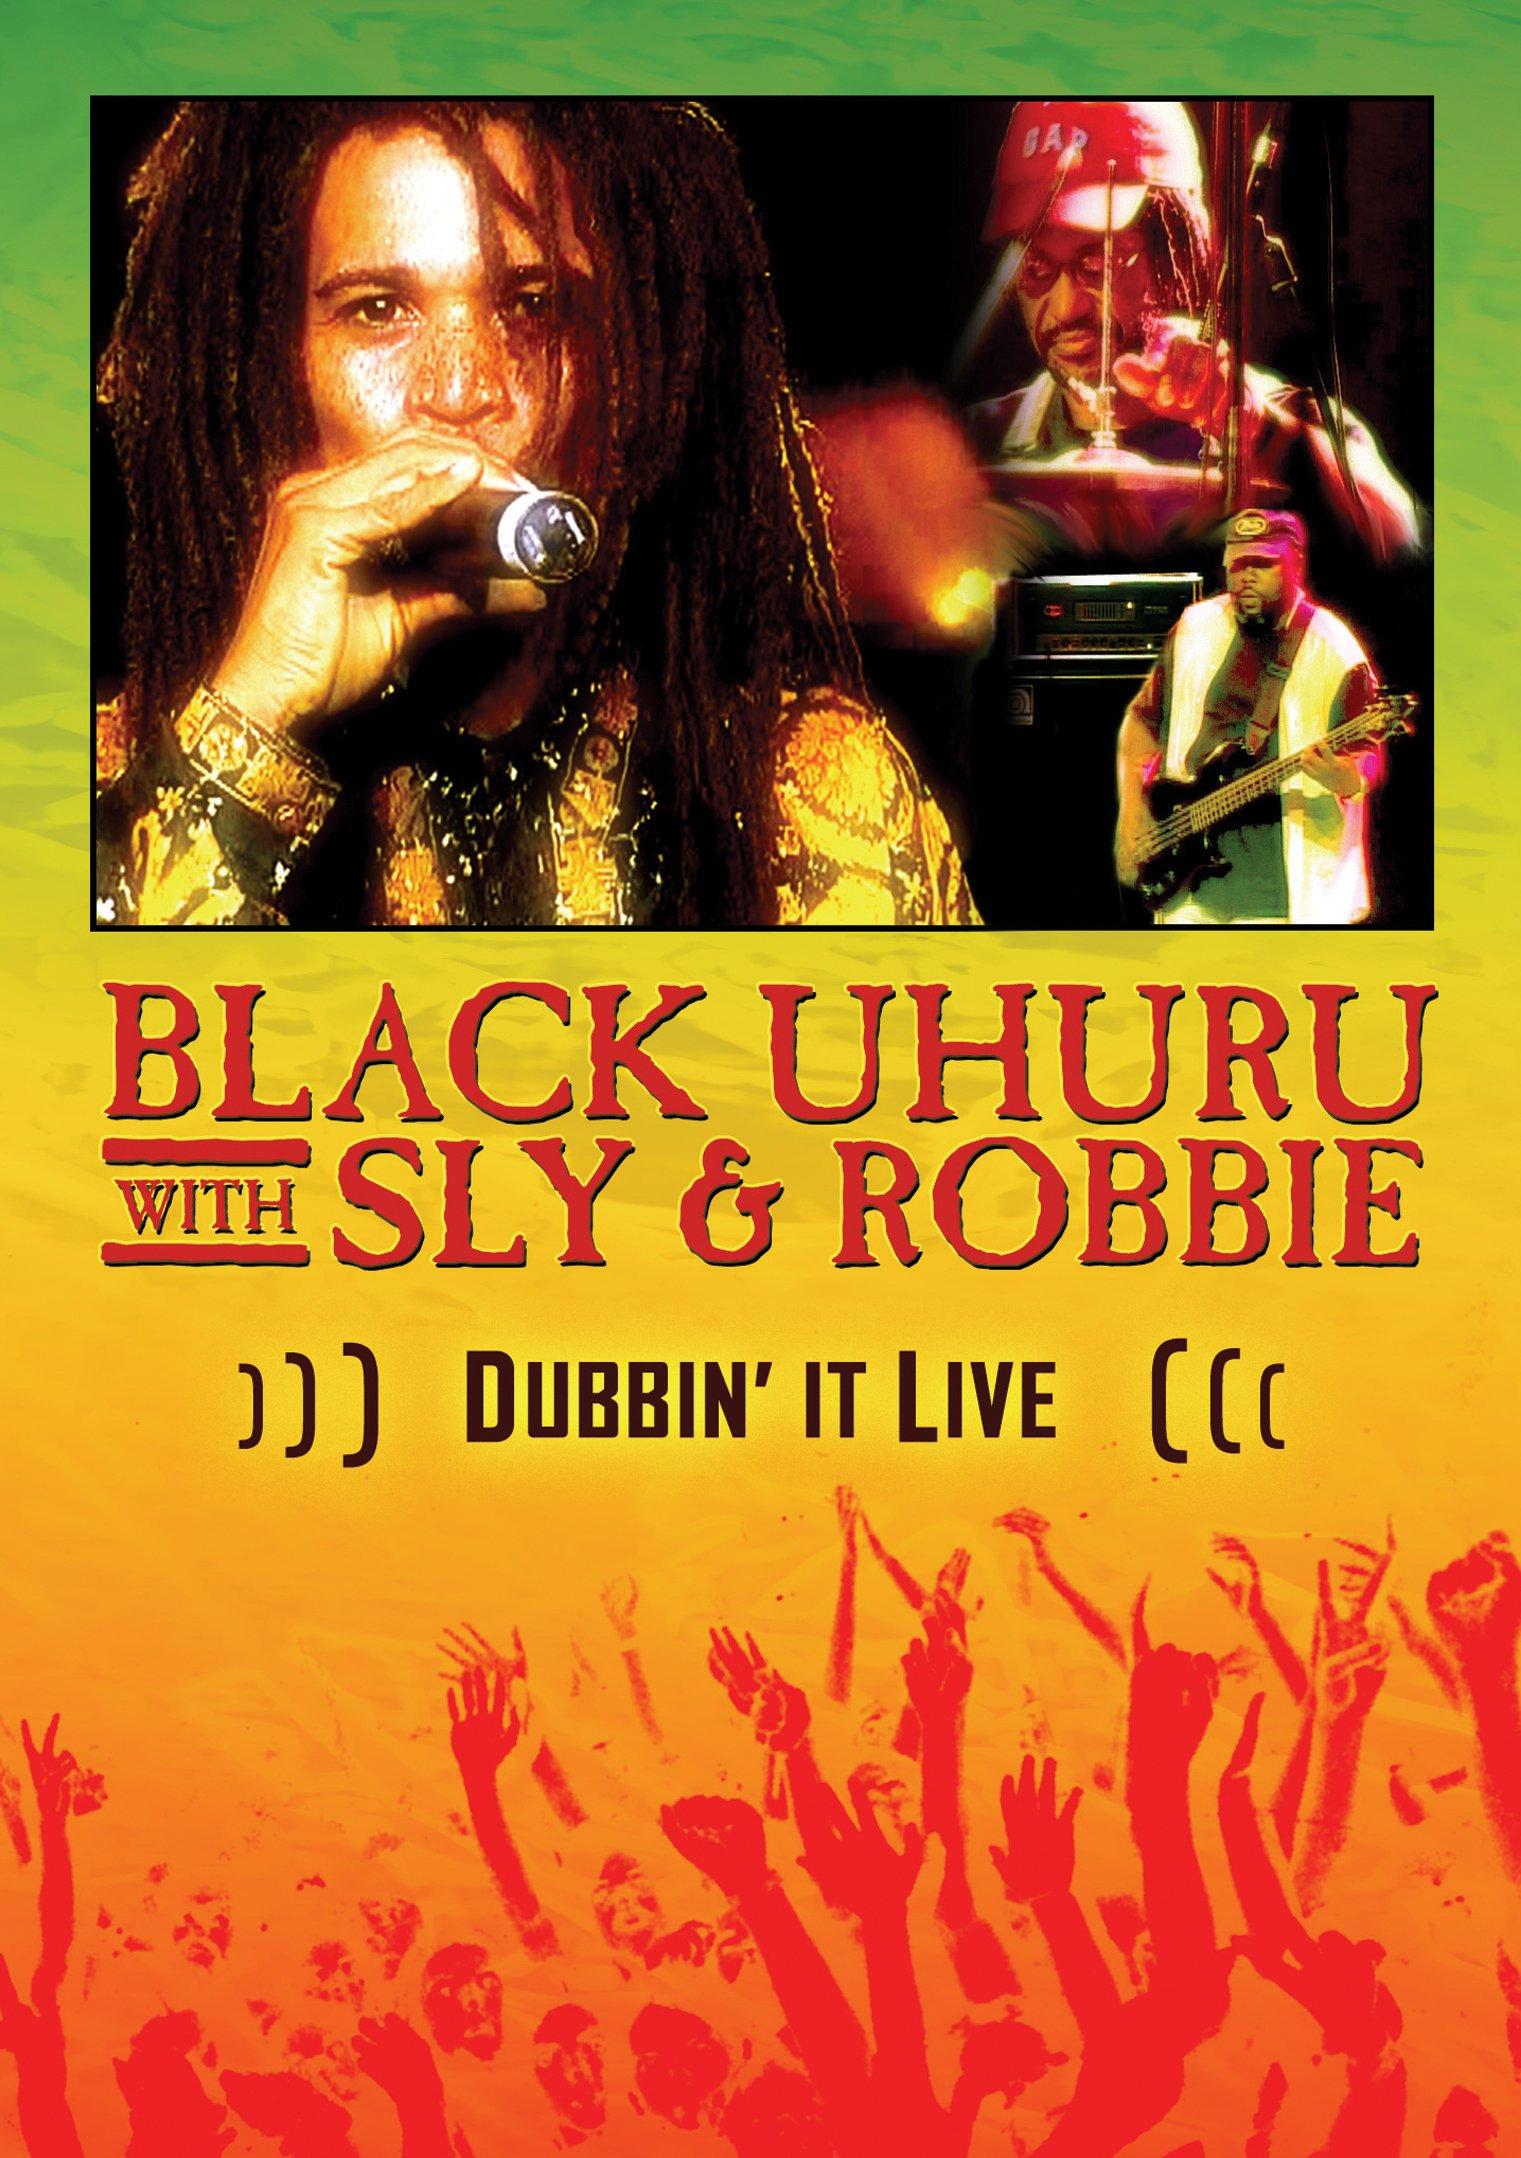 Dubbin It Live by BLACK UHURU